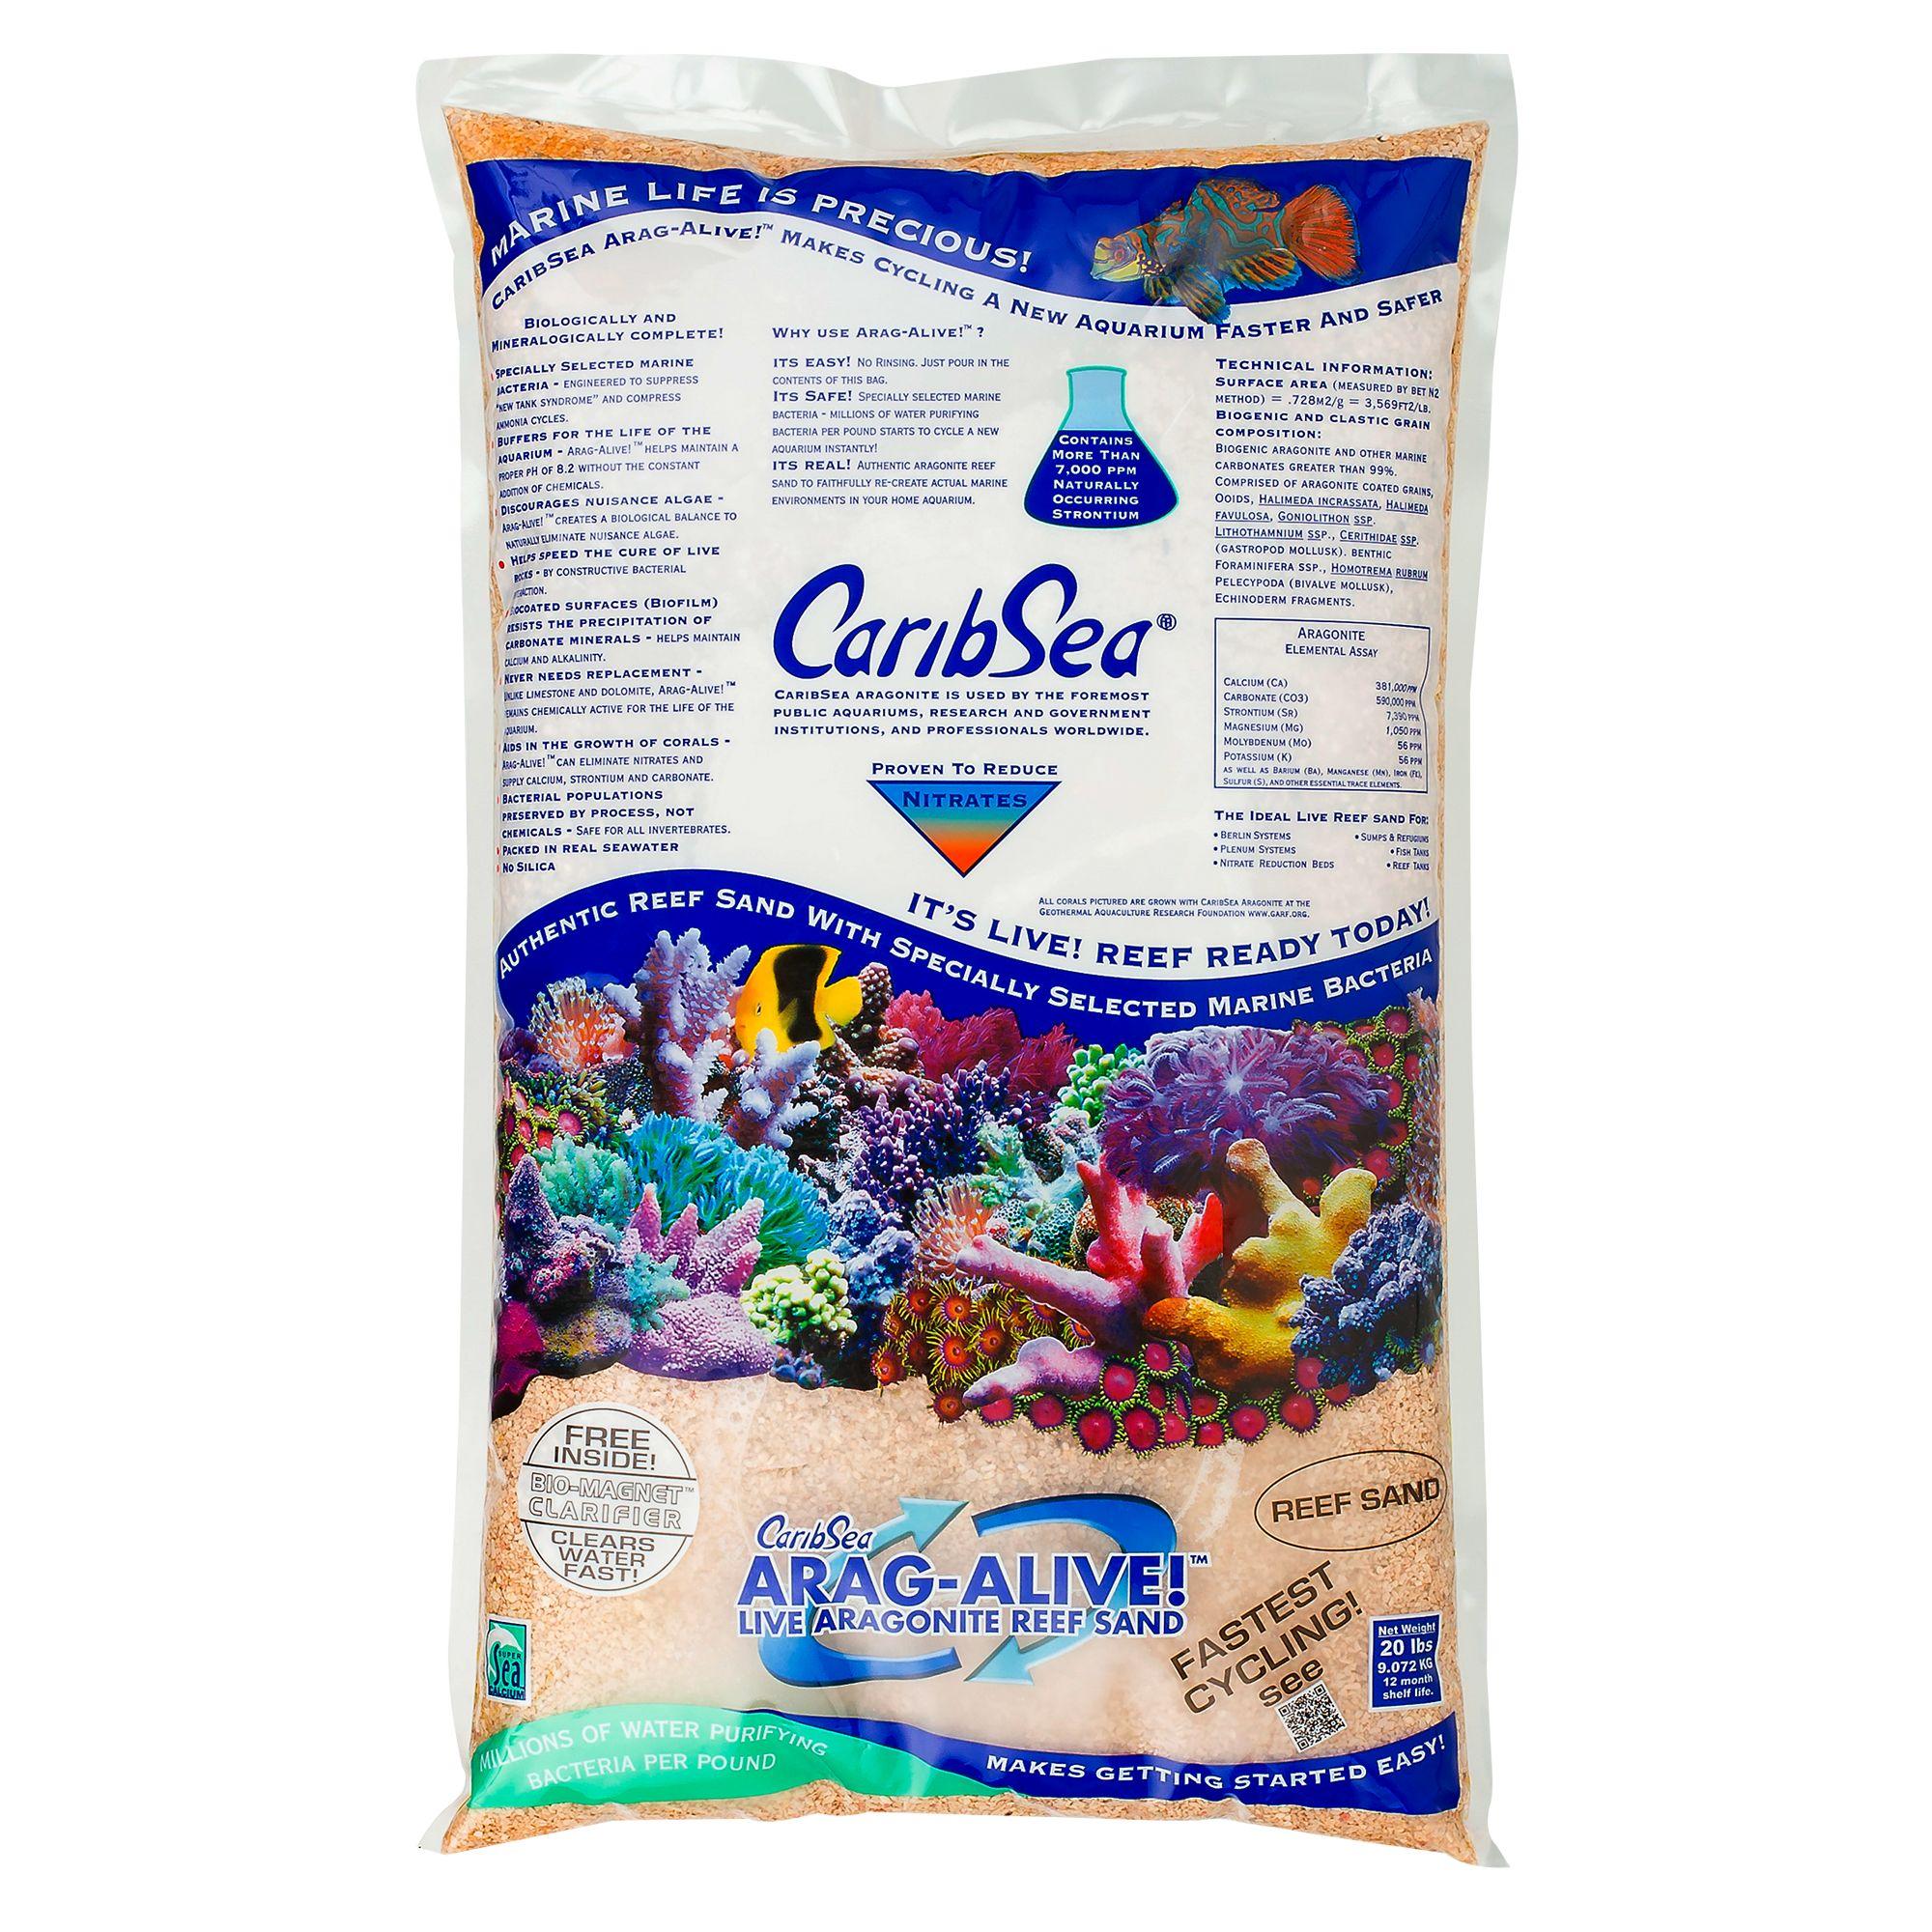 Caribsea Aragalive Reef Sand Size 20 Lb